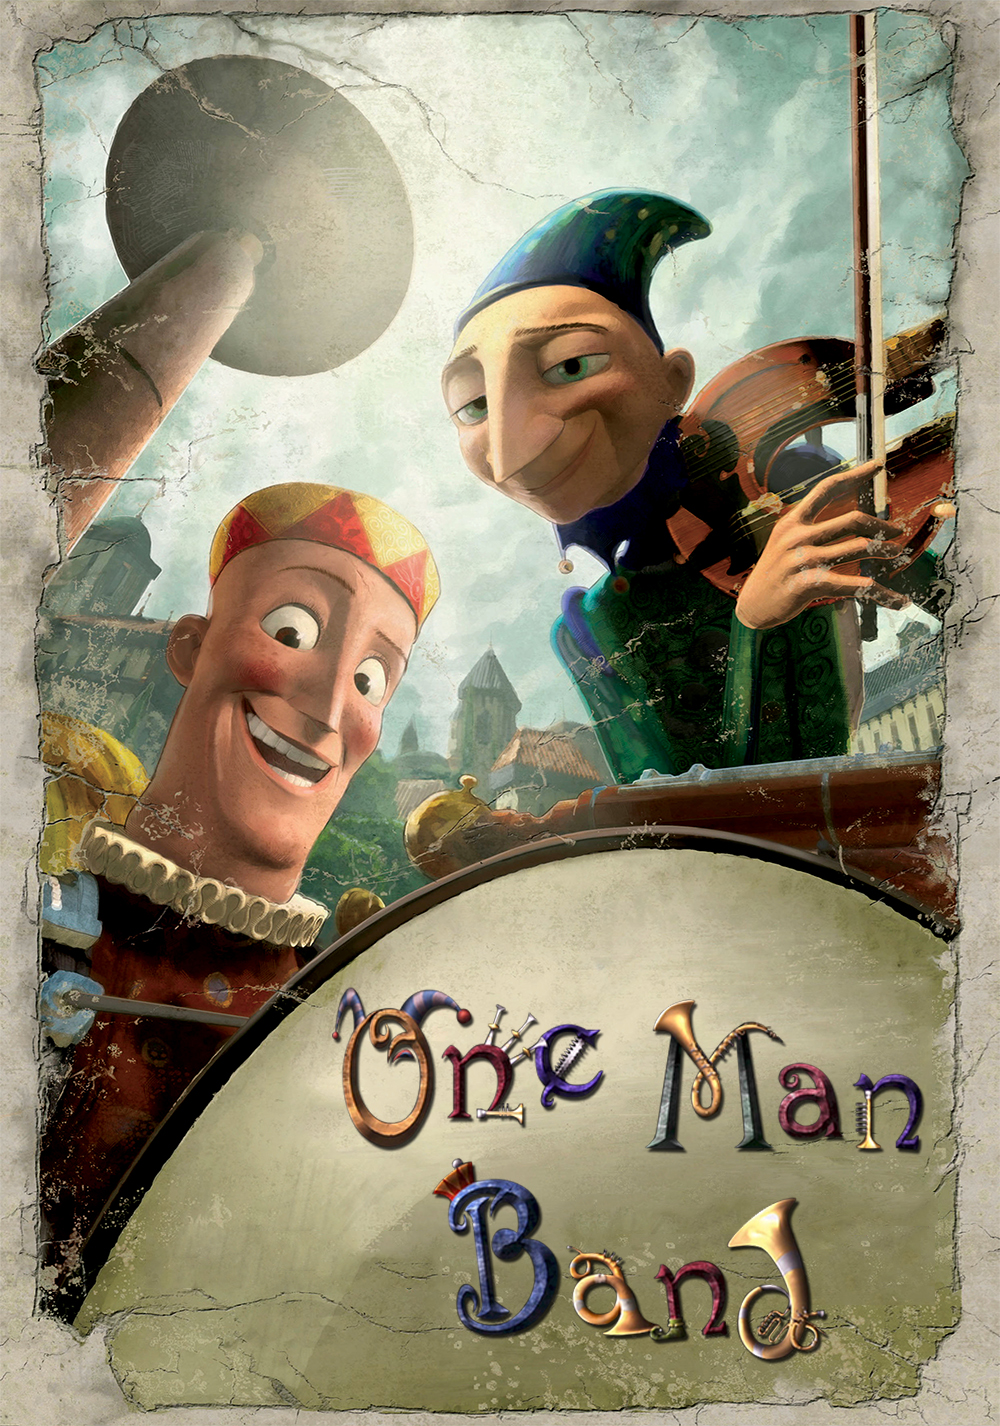 Pixar disney affiche poster l'homme orchestre one man band